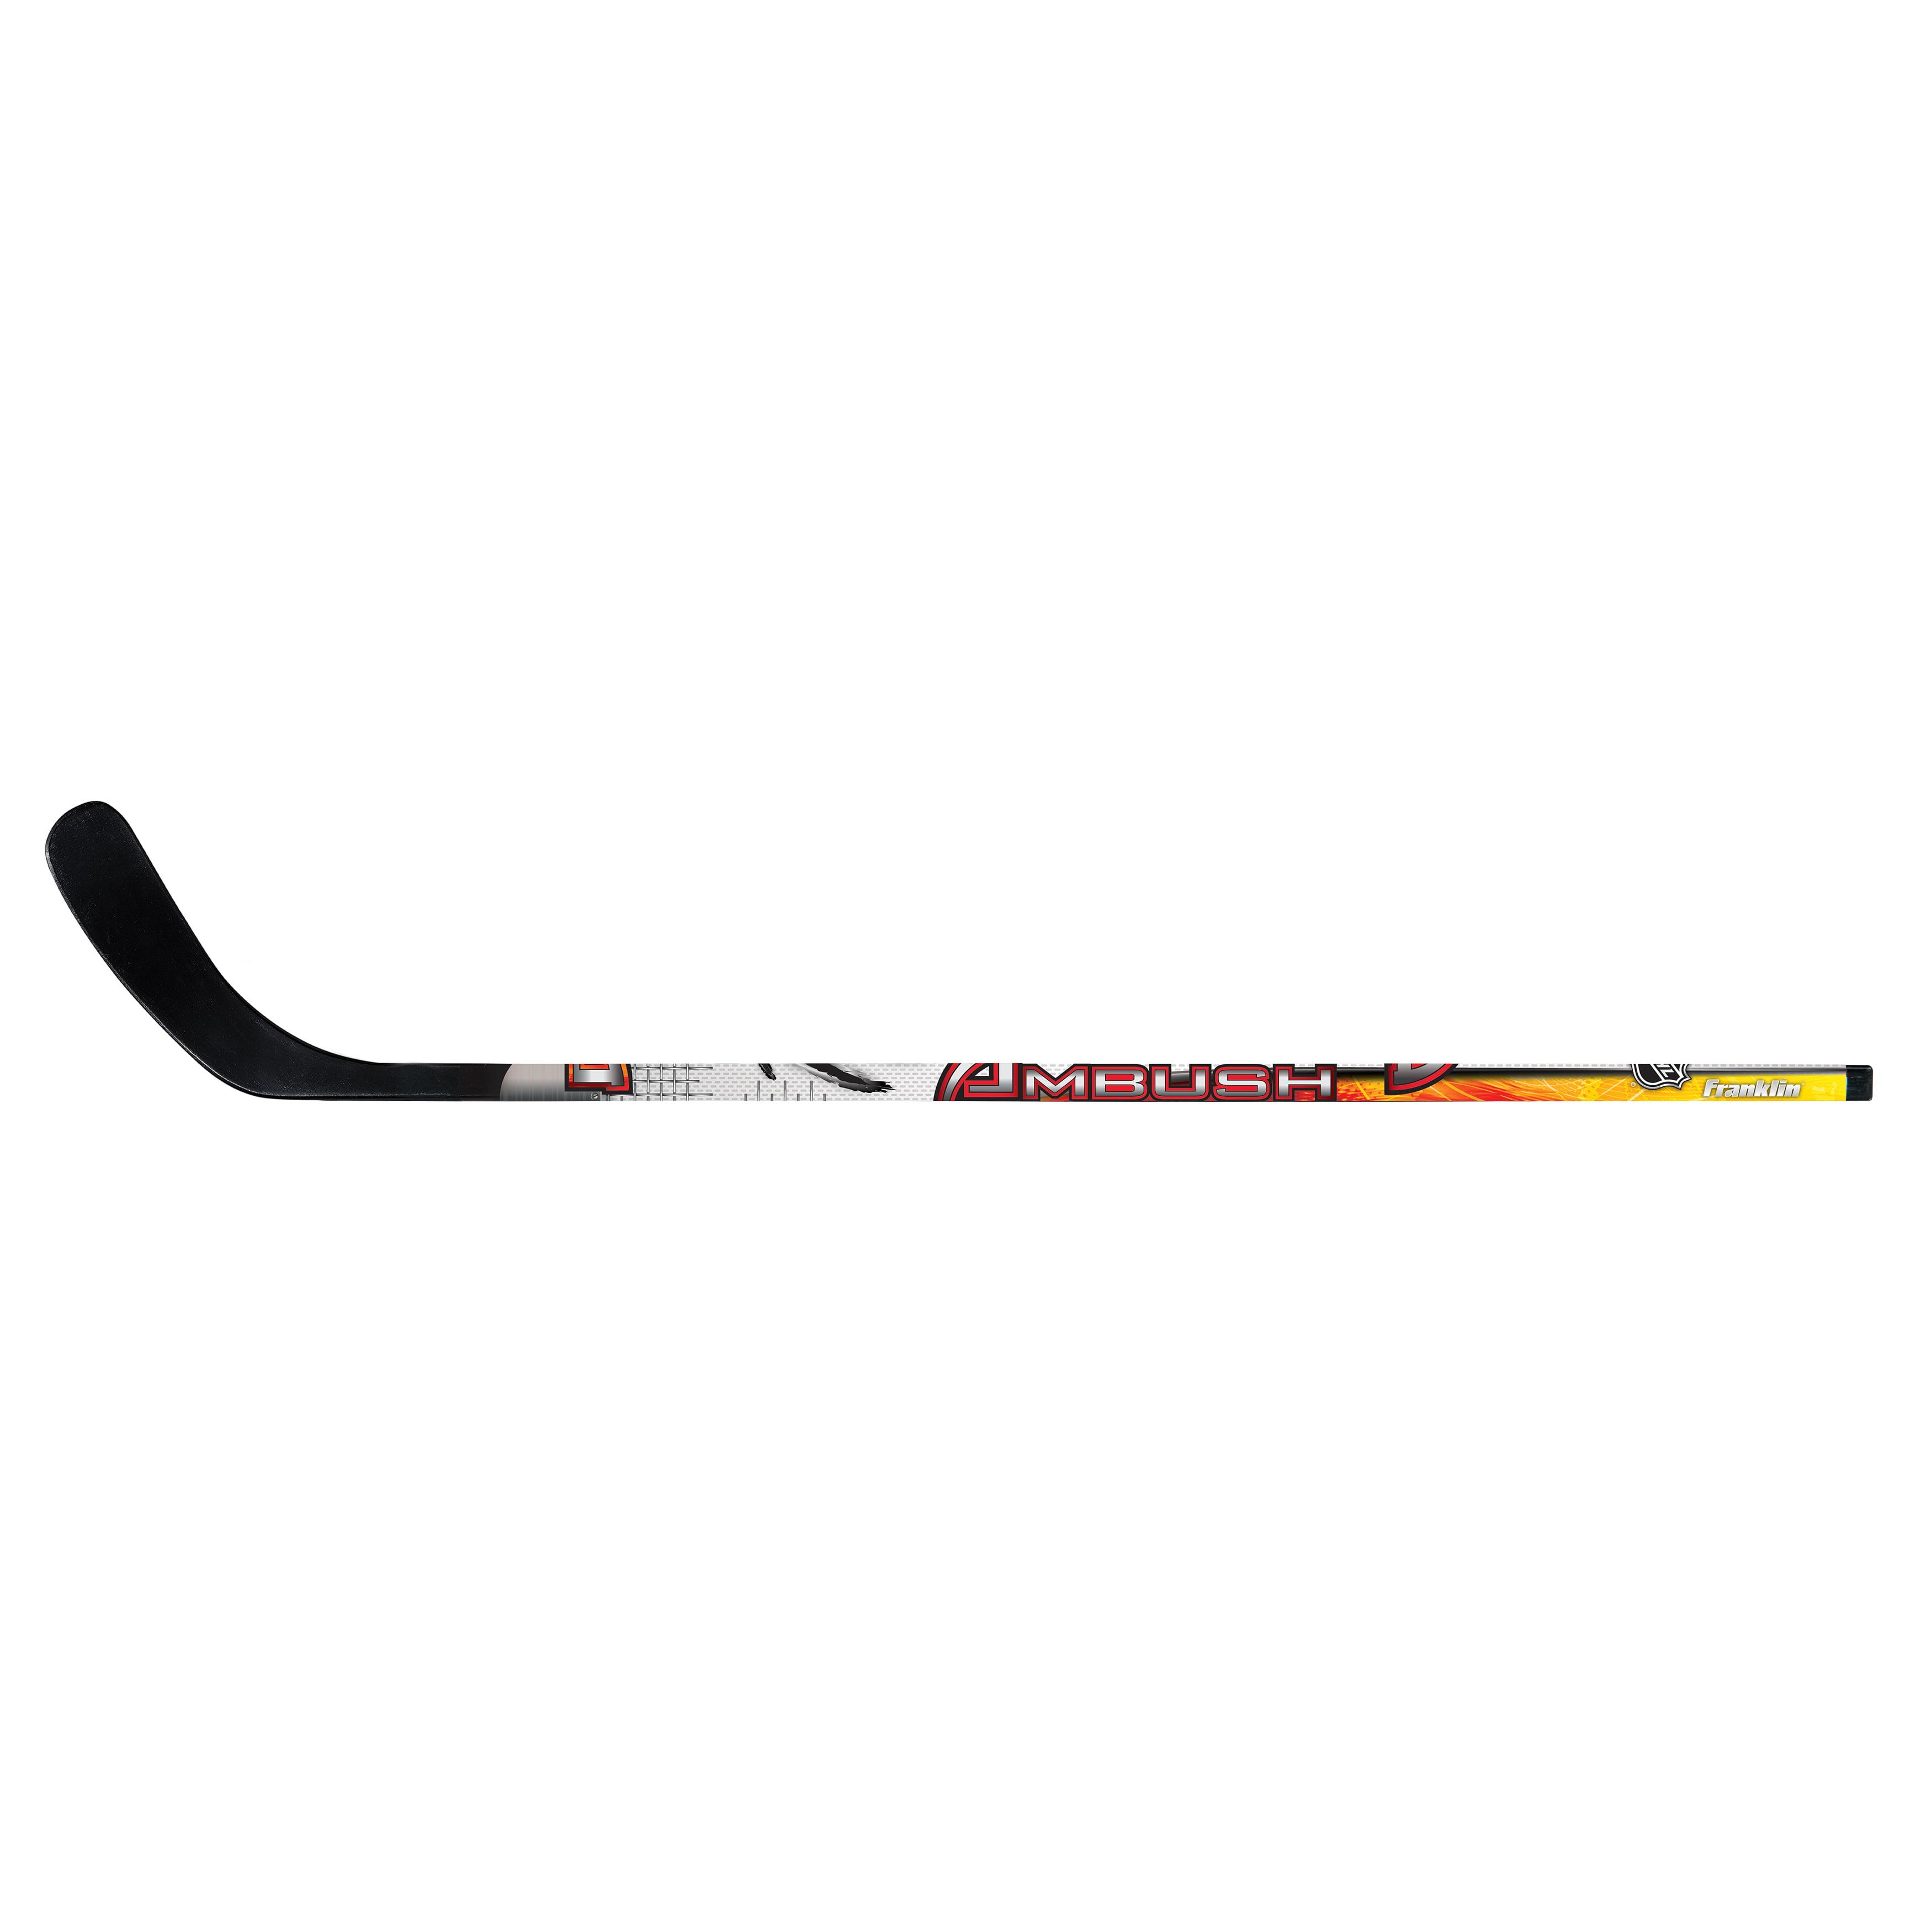 "Franklin Sports Youth Right Shot Ambush Street Hockey Stick 46"" by Franklin Sports"